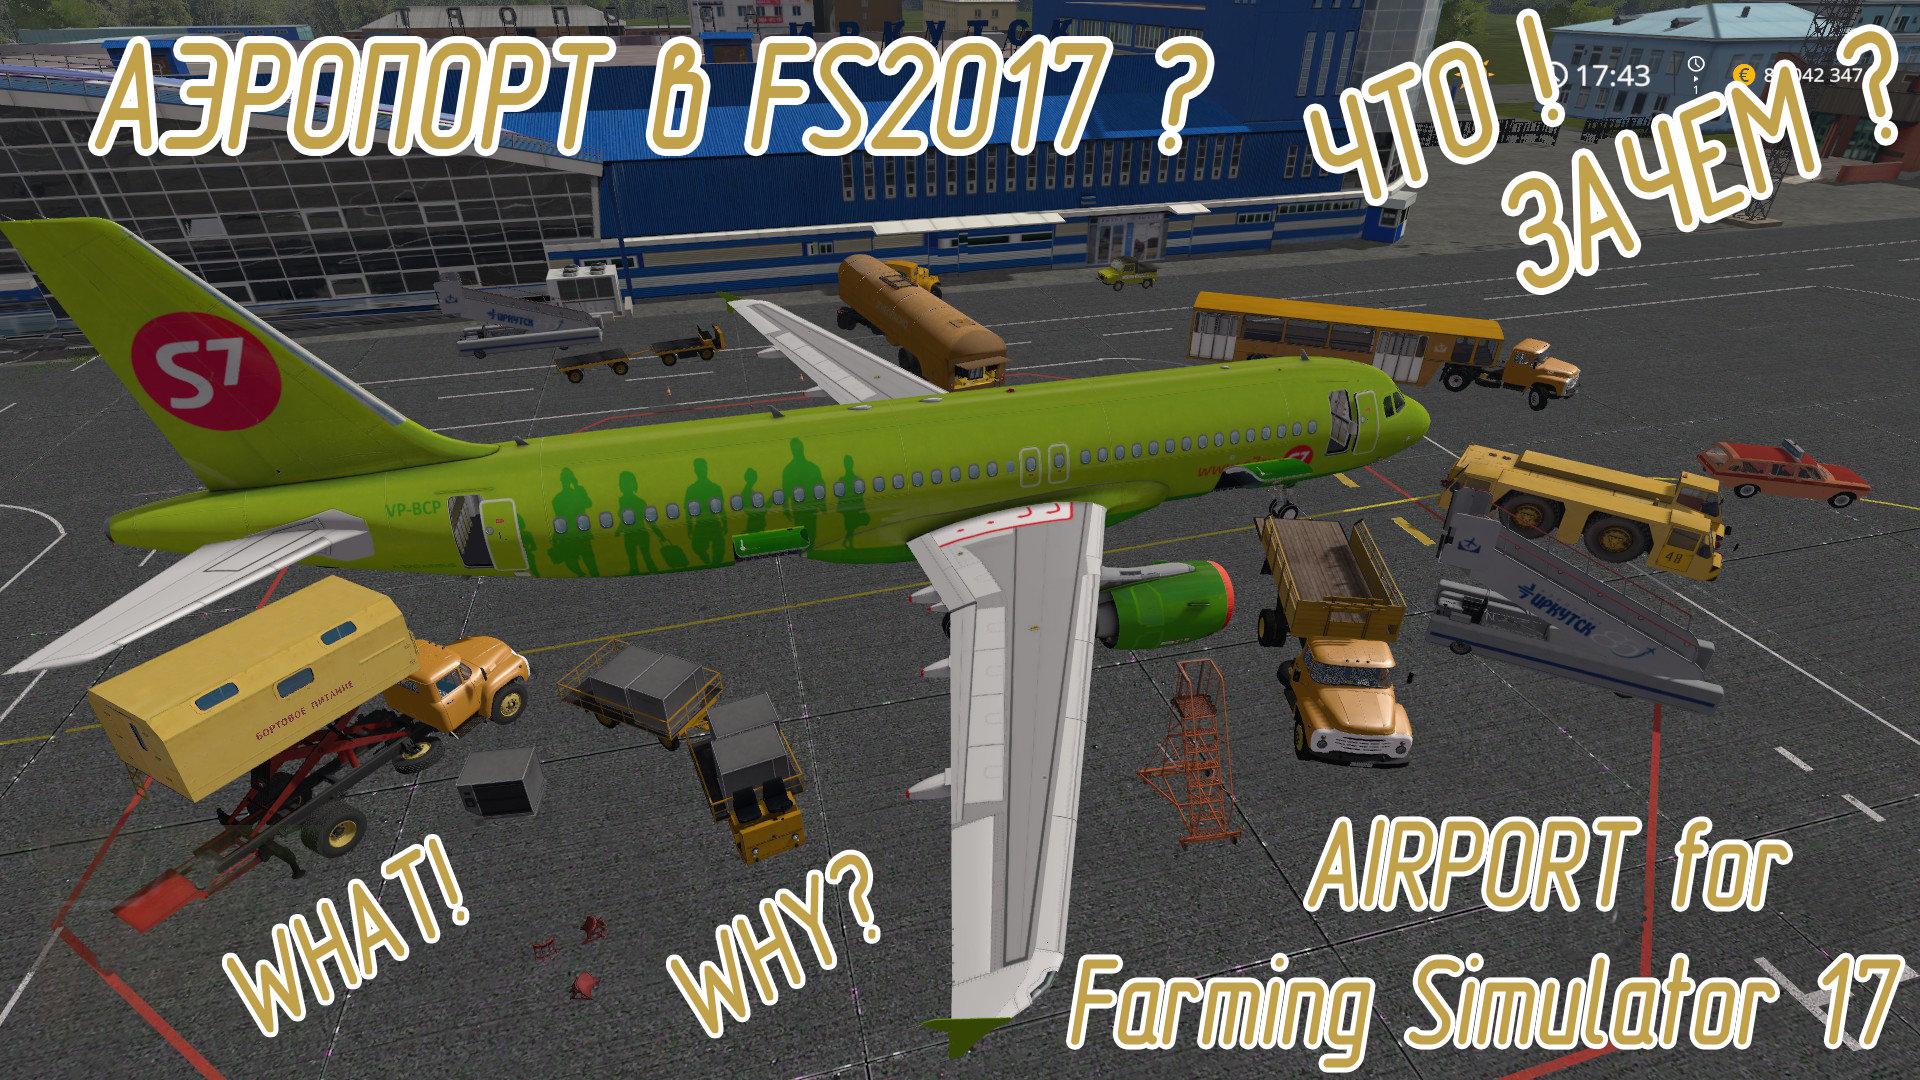 Airport for Farming Simulator 17 #2 - iksman - AVSIM su Forums